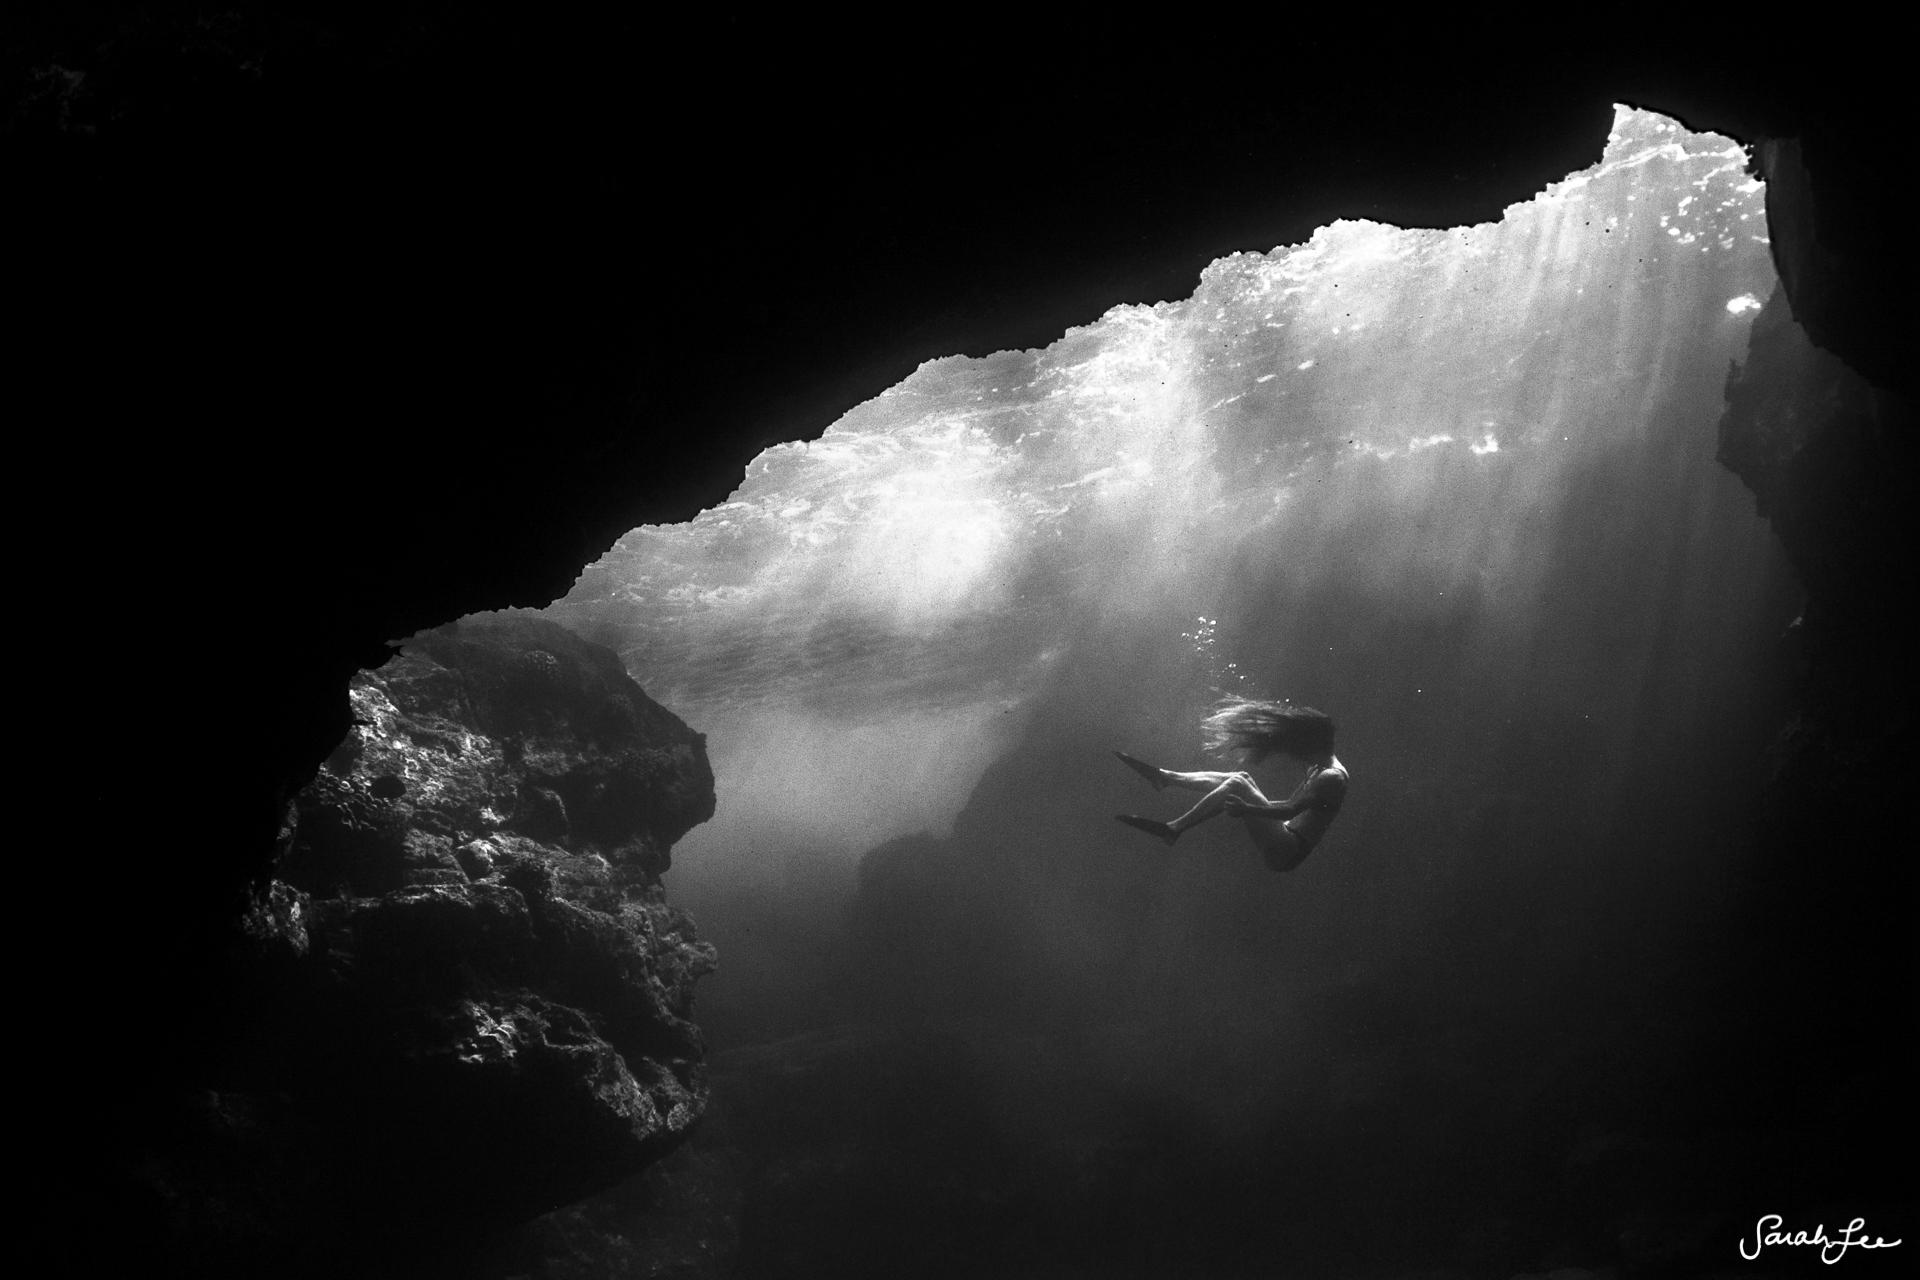 021_Sarah_Lee_Photography_Underwater_4255.jpg